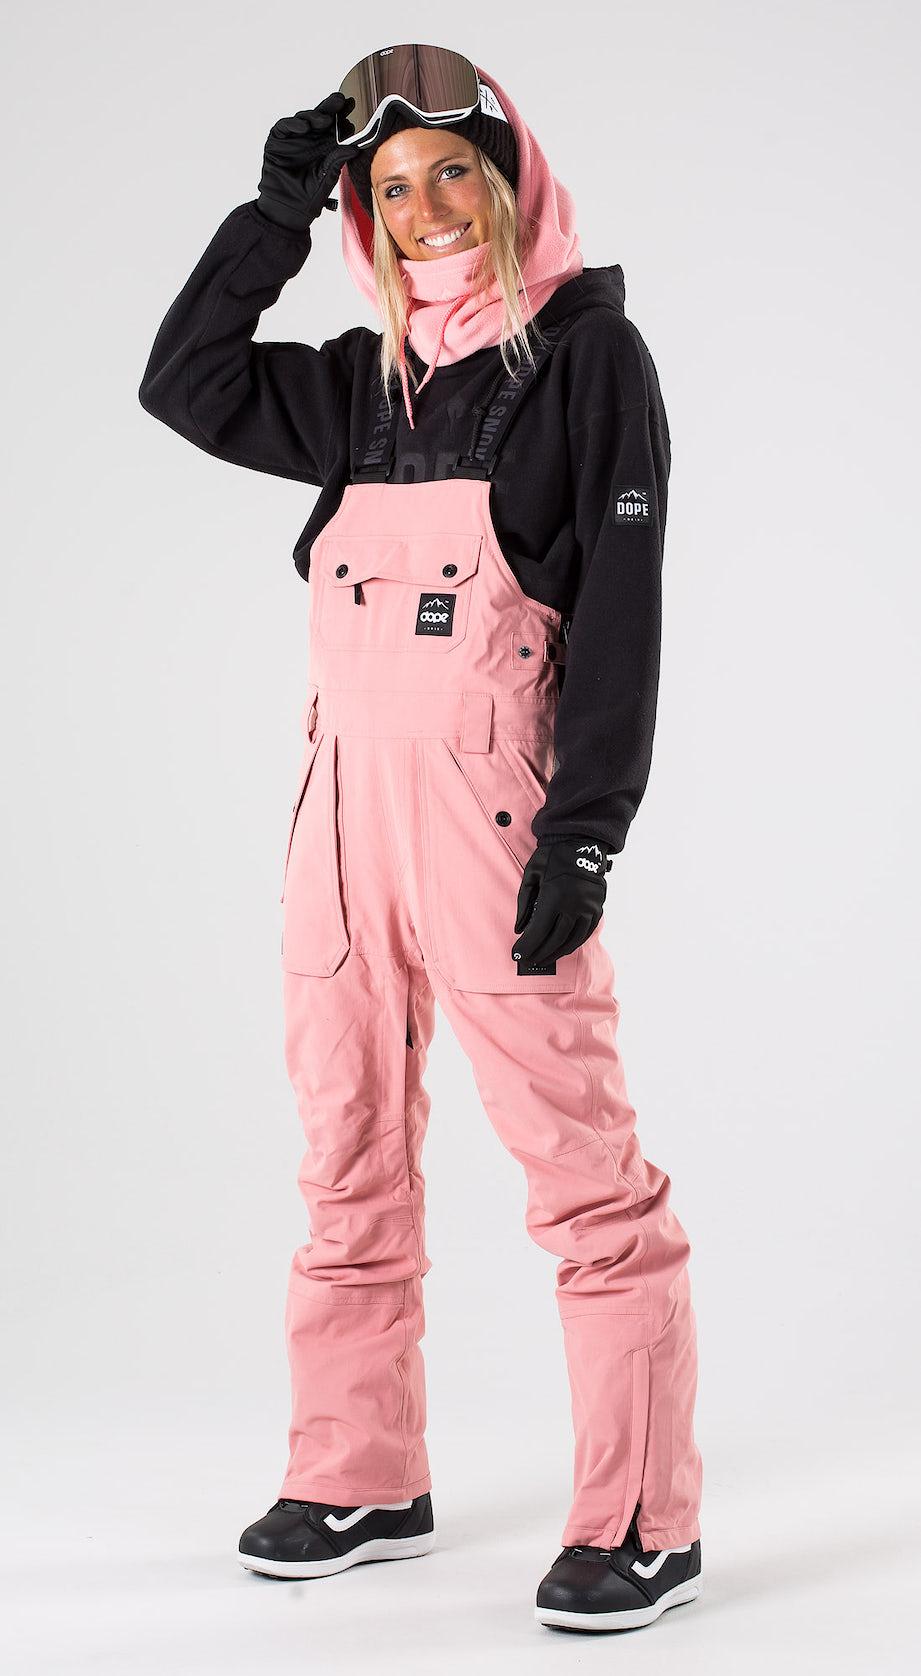 Dope Yeti W Black Snowboard clothing Multi